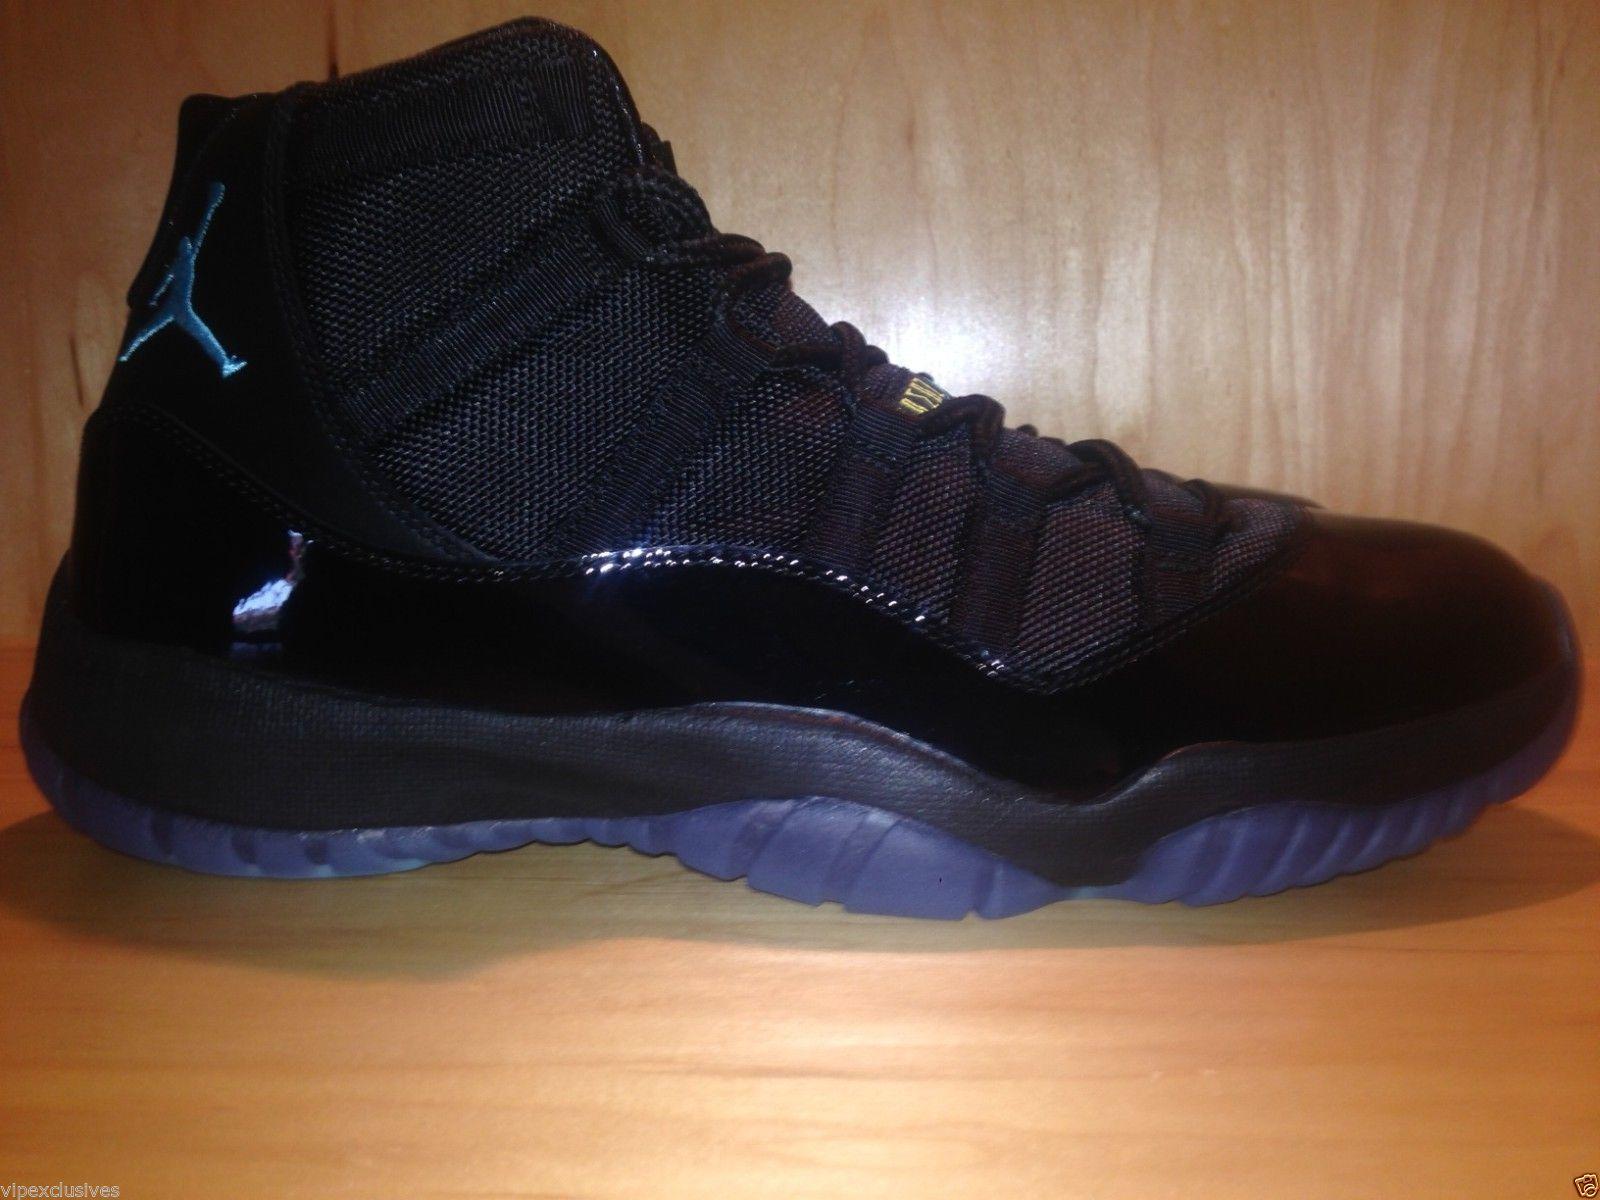 newest b9f58 ecdf3 Nike Air Jordan Retro 11 Gamma Blue Black Varsity Maize 378037-006 GS4-7  men8-13